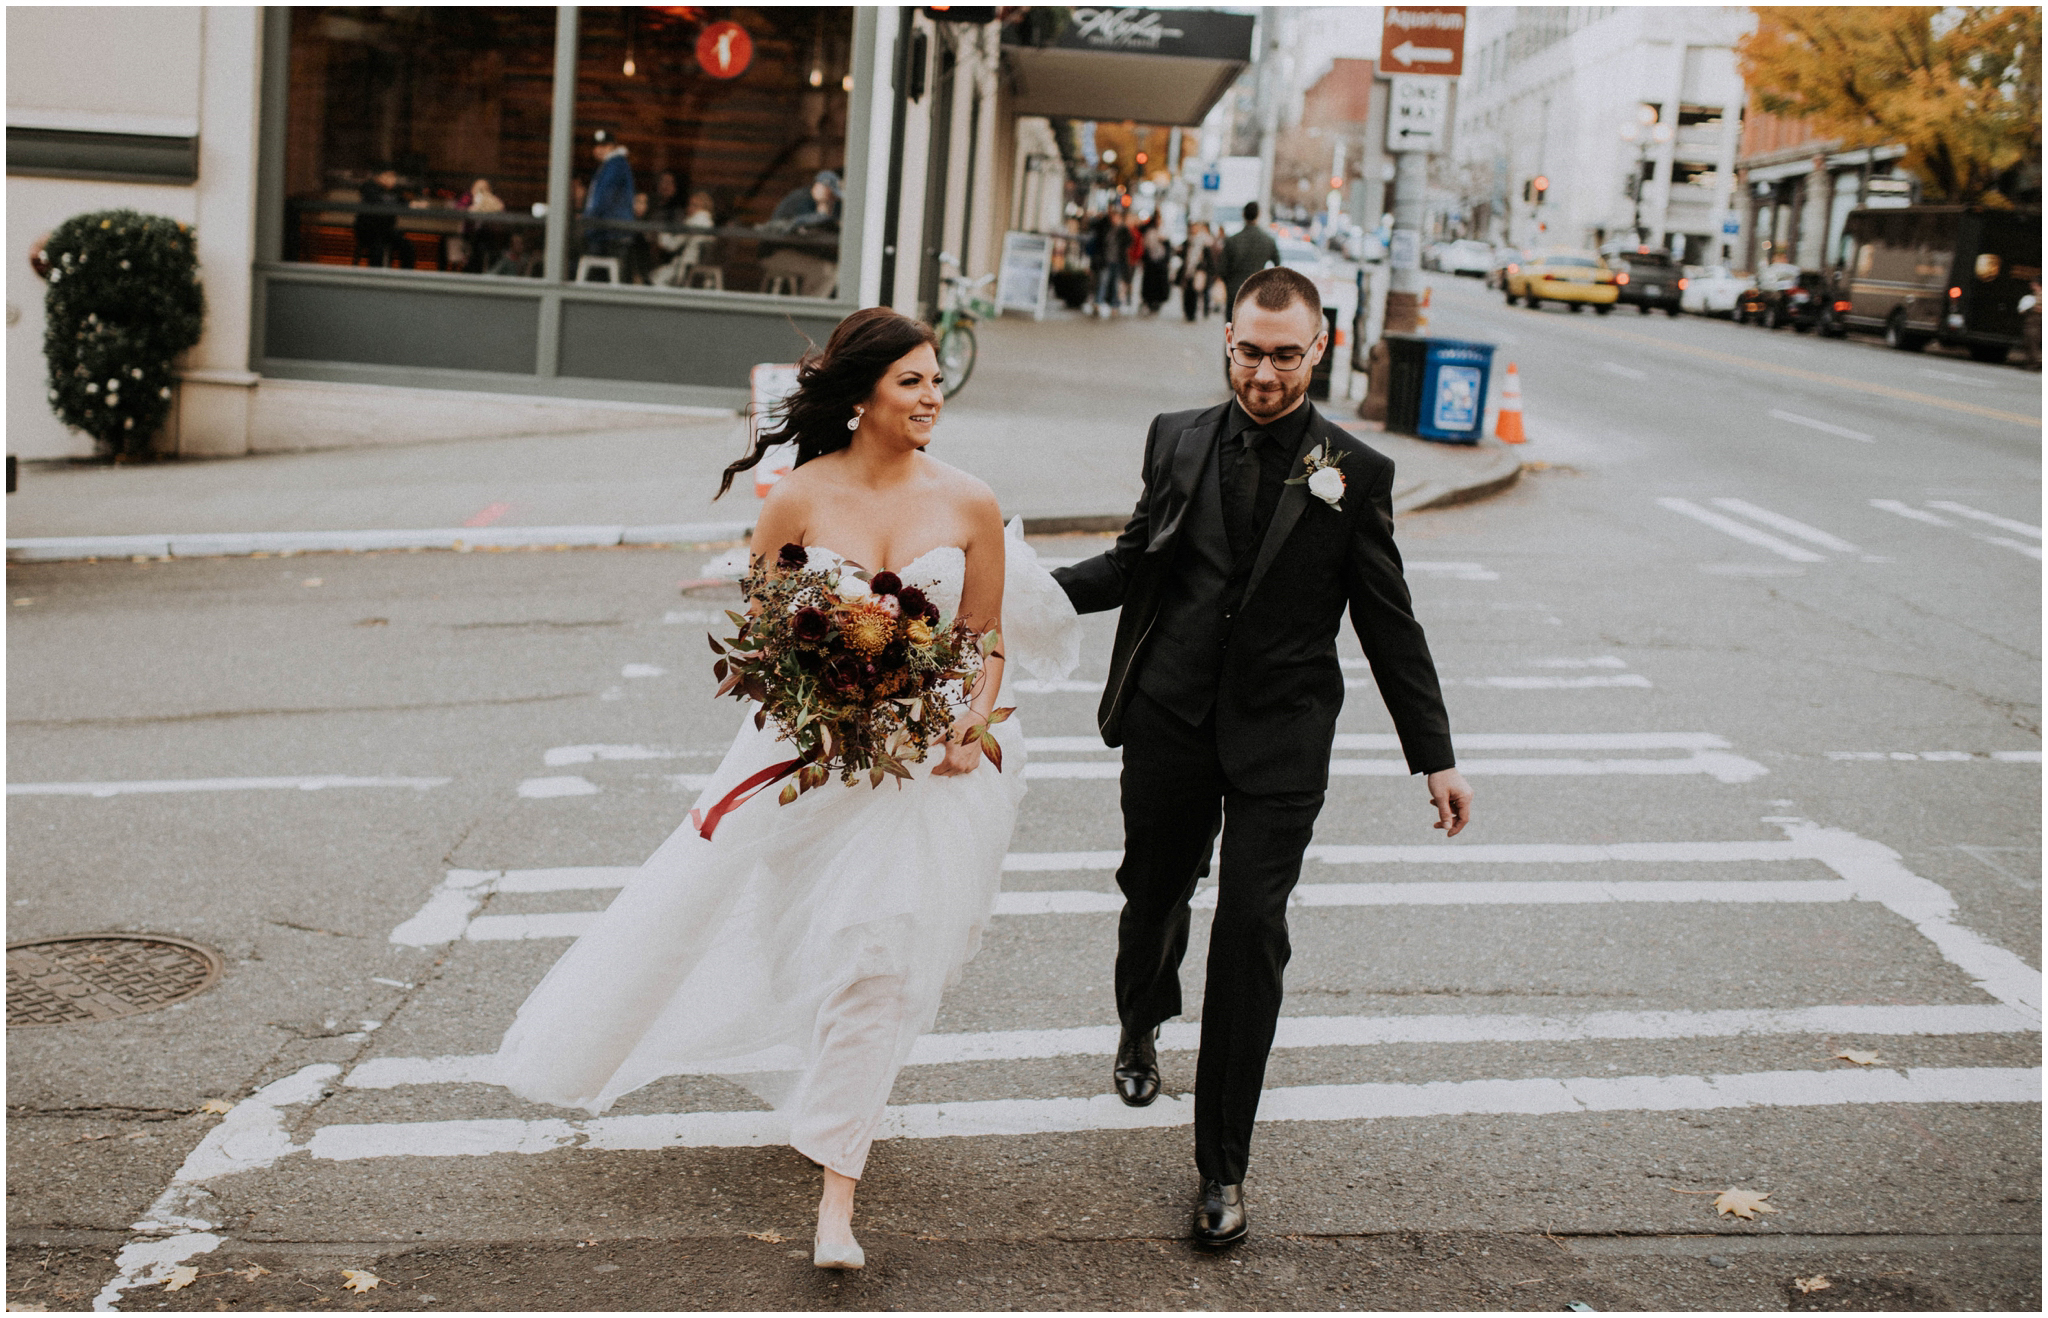 danny+mackenzie+downtown-seattle-axis-wedding-seattle-photographer-037.jpg